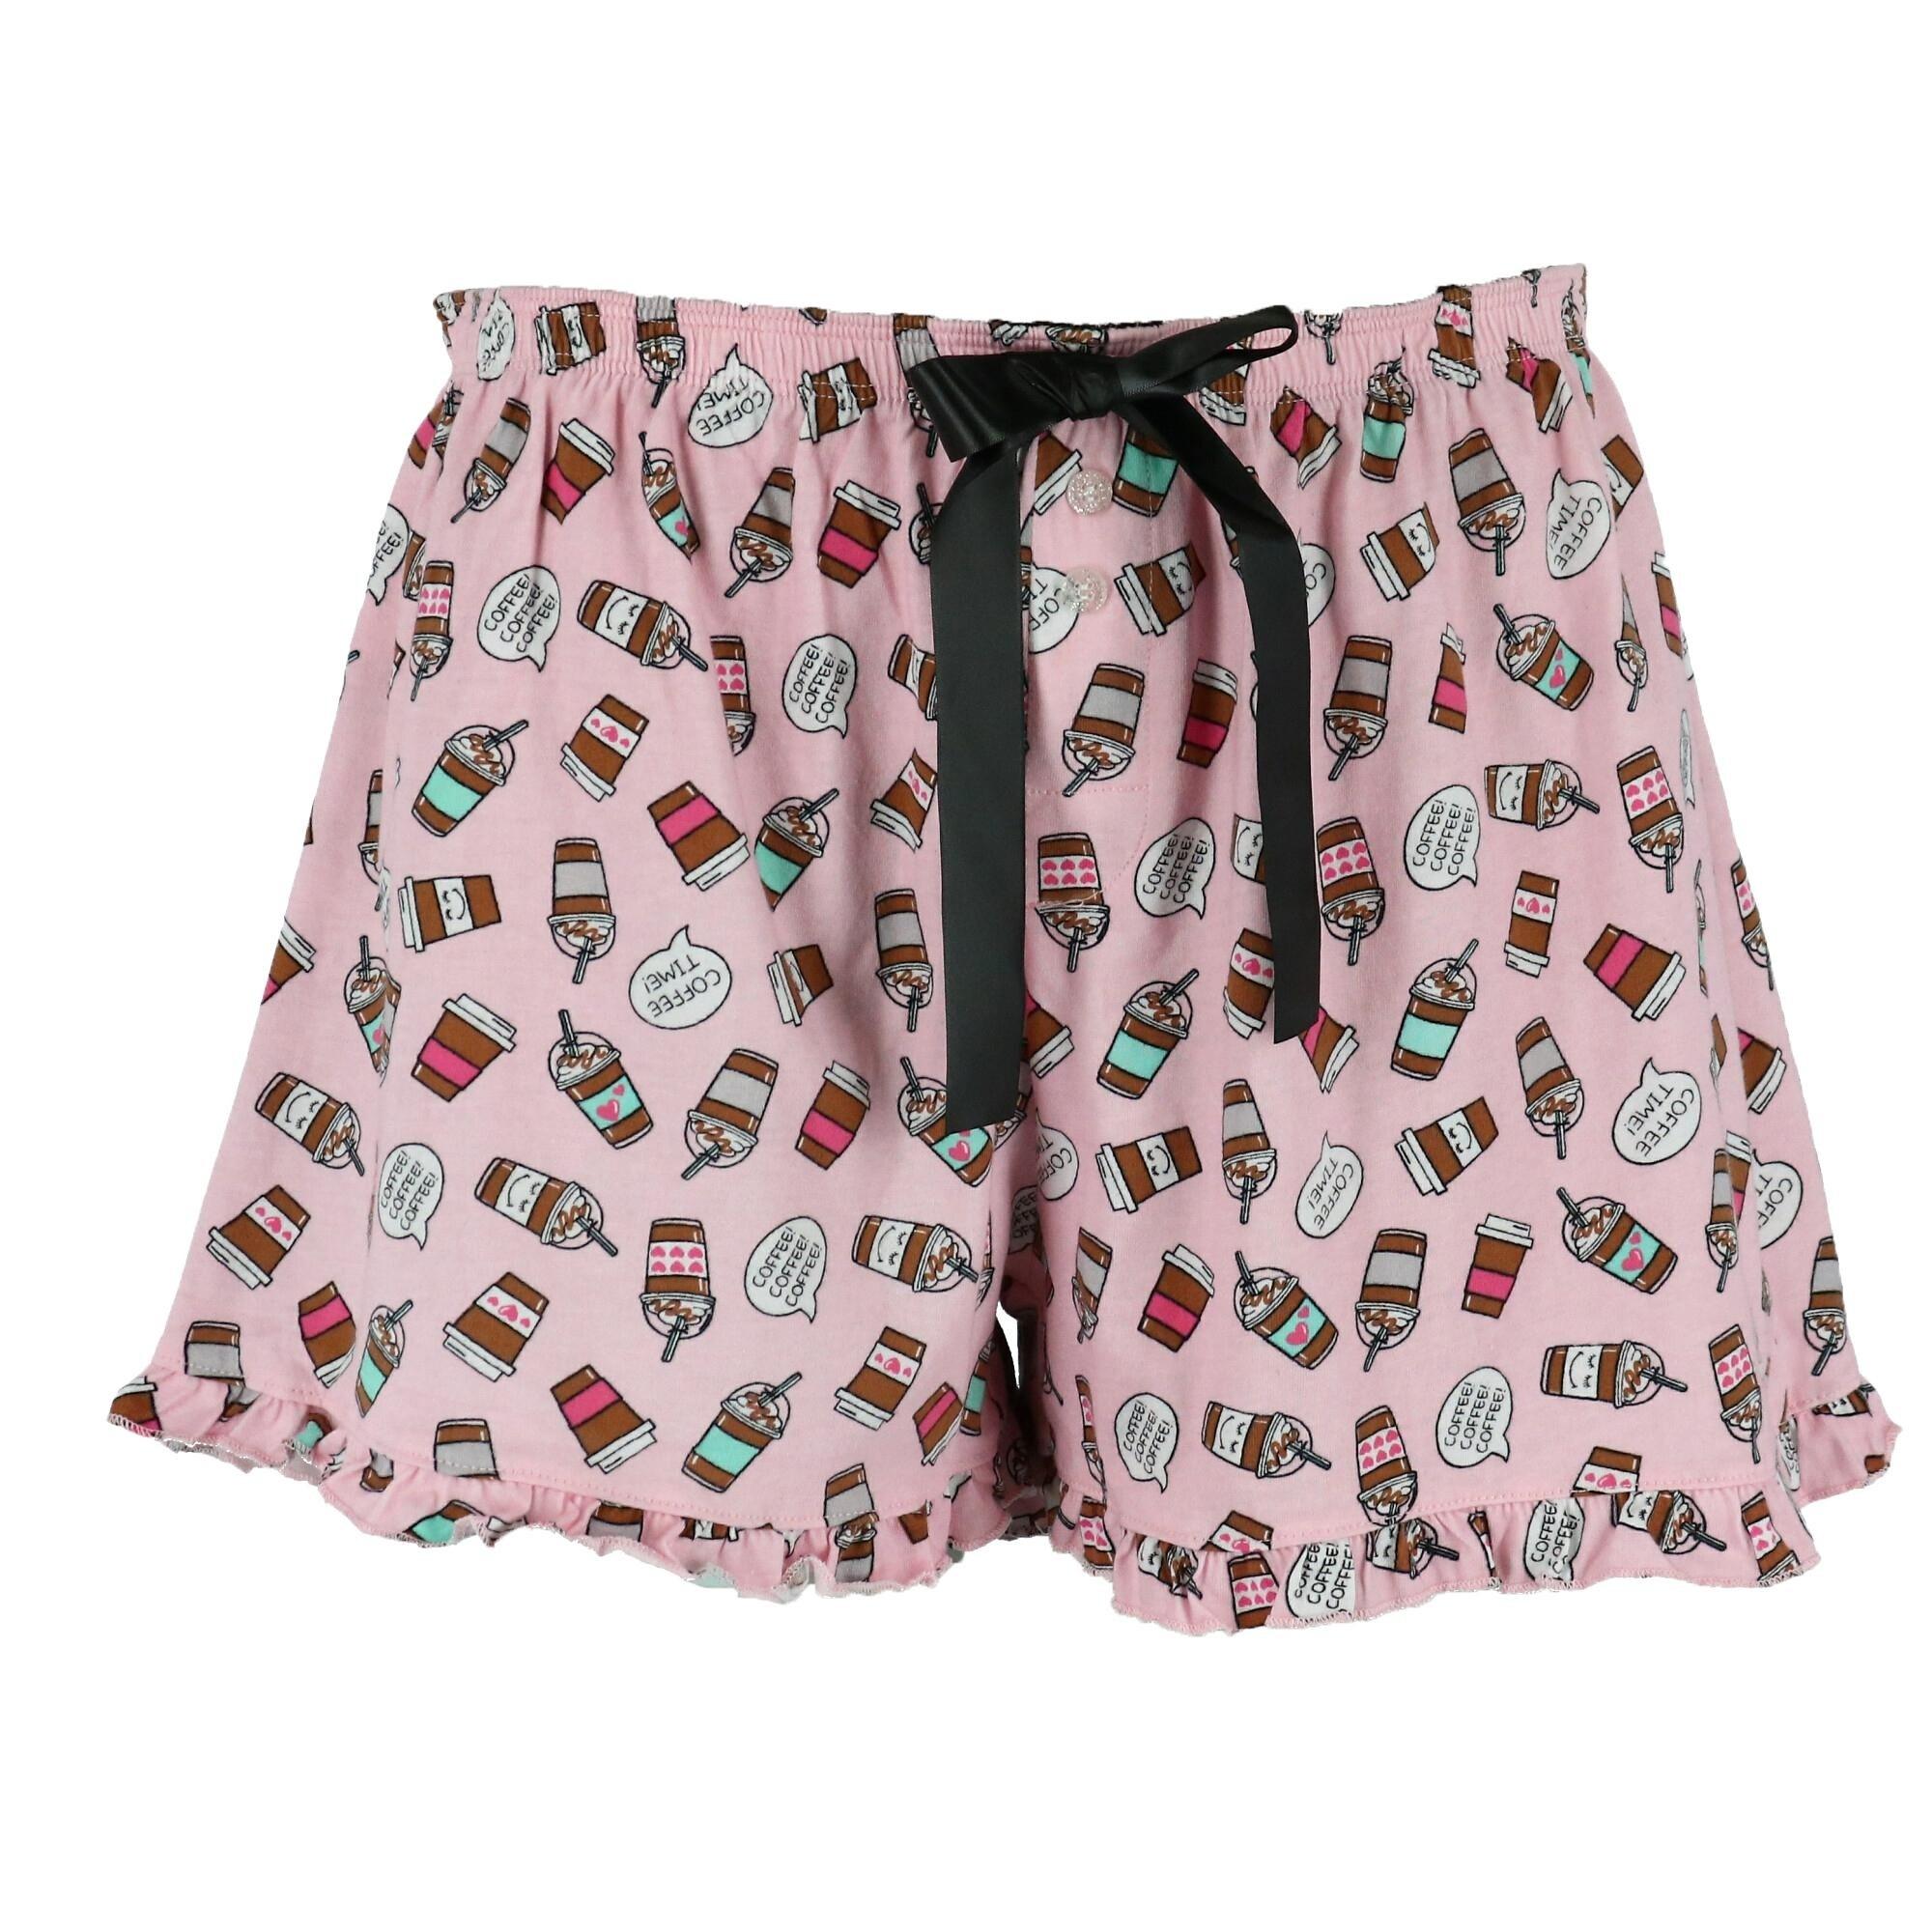 b3bdf665556 LaLa Sleepwear Junior's Plus Size Tank and Shorts Pajama Set